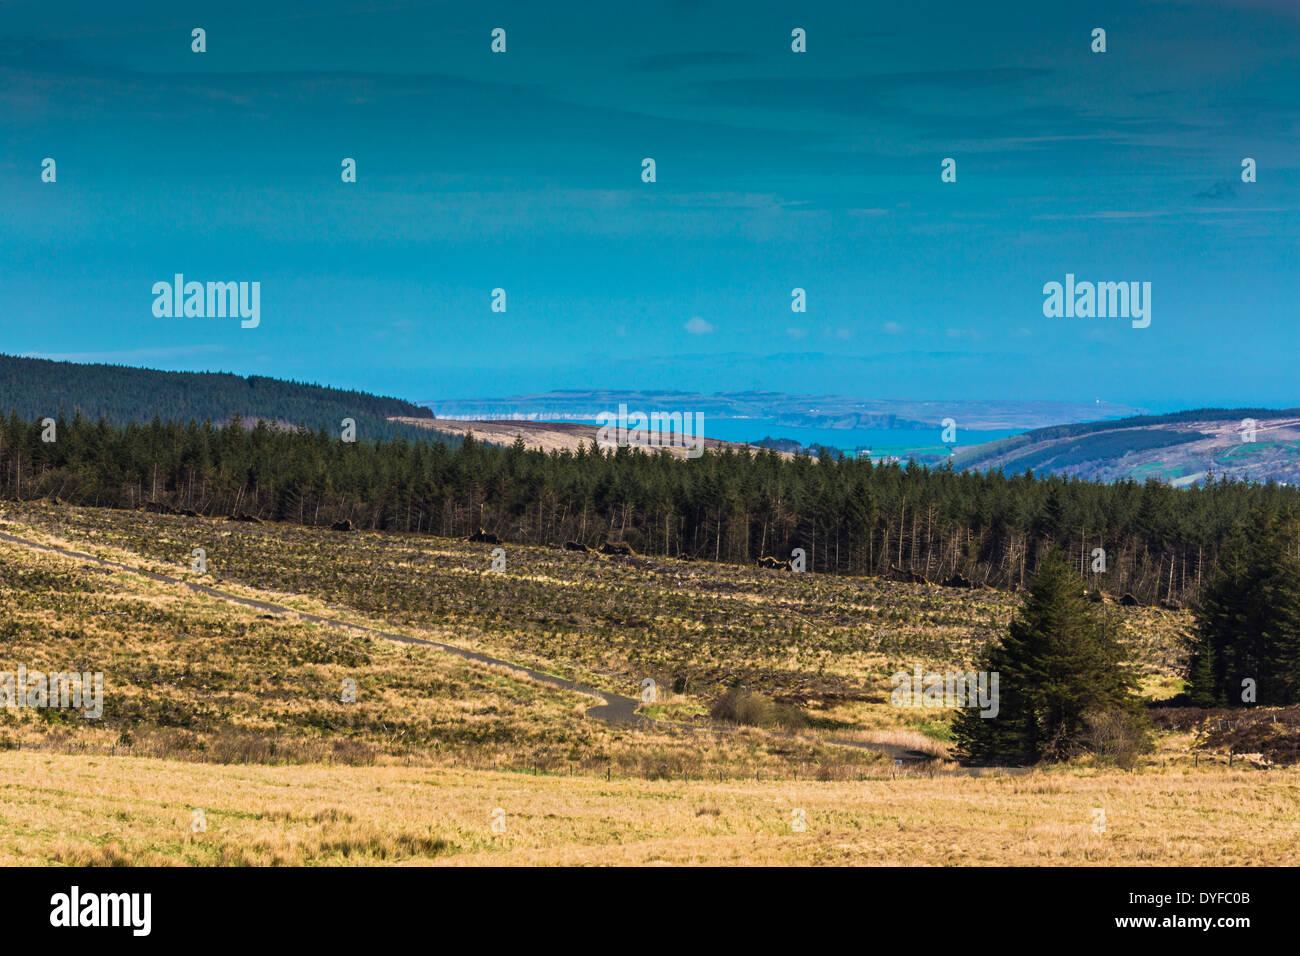 Rathlin Island  viewed from Orra Mountain through Glenshesk County Antrim Northern Ireland - Stock Image